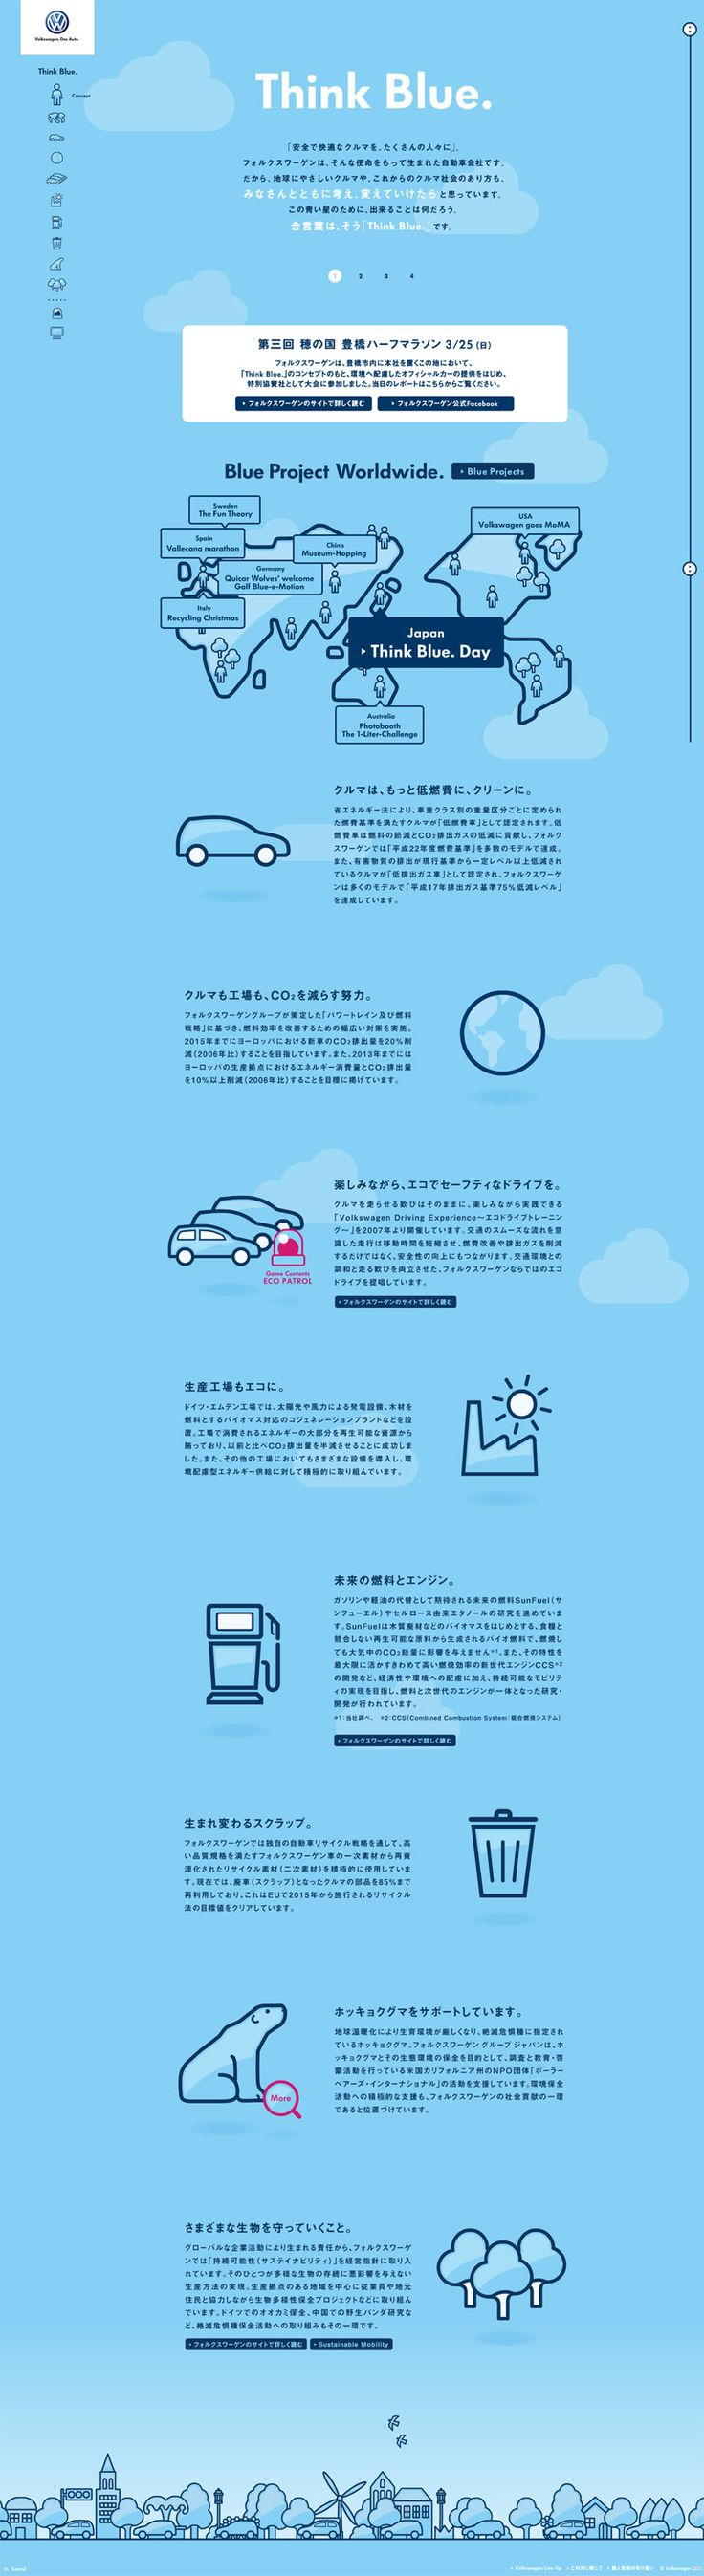 Unique Web Design, Volkswagen Japan http://www.pinterest.com/aldenchong/) more…